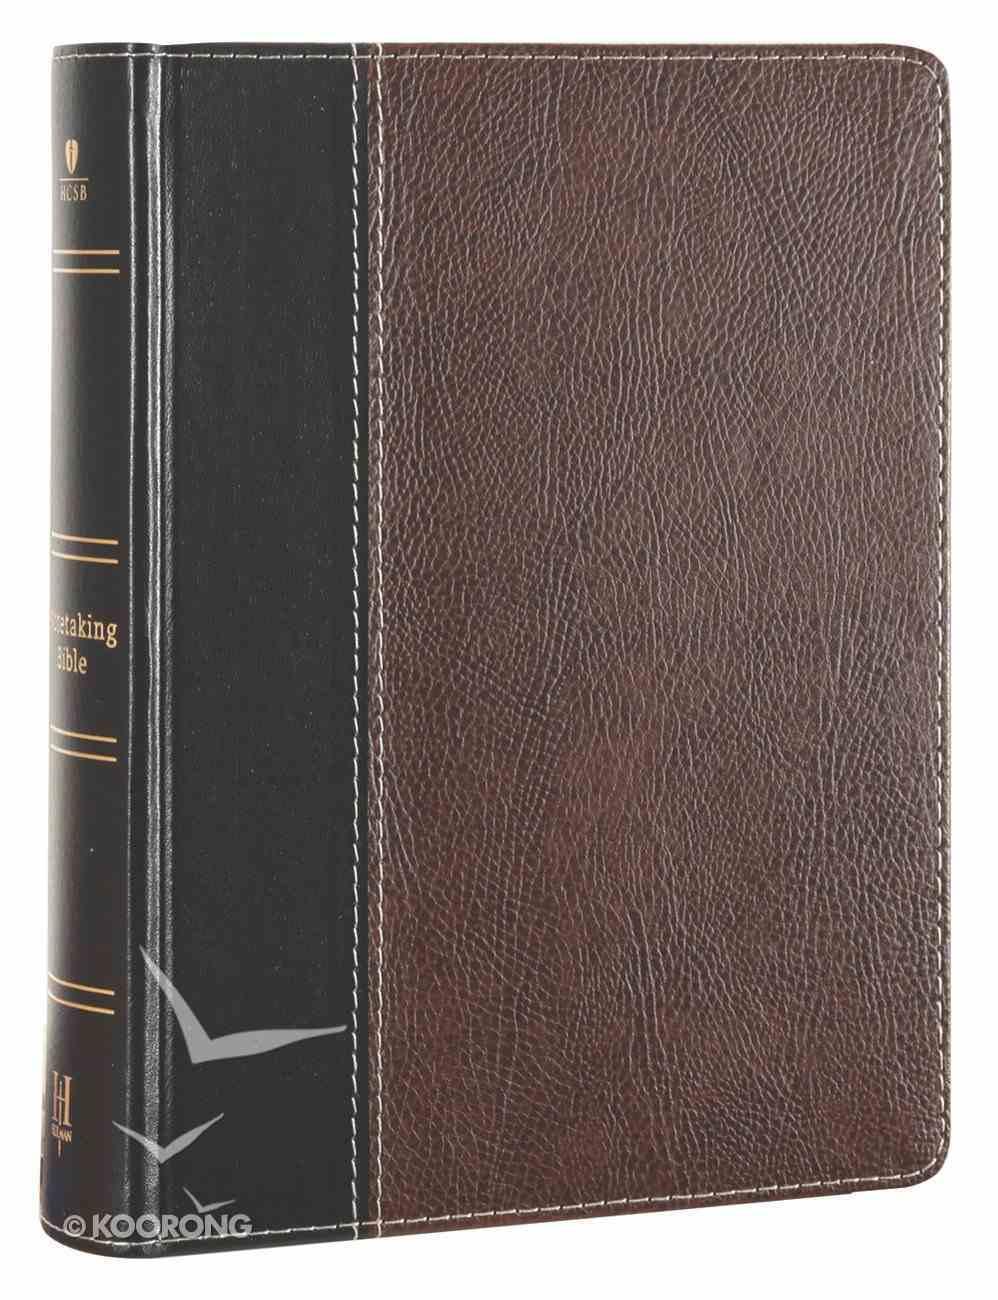 HCSB Notetaking Bible Black/Brown Bonded Leather